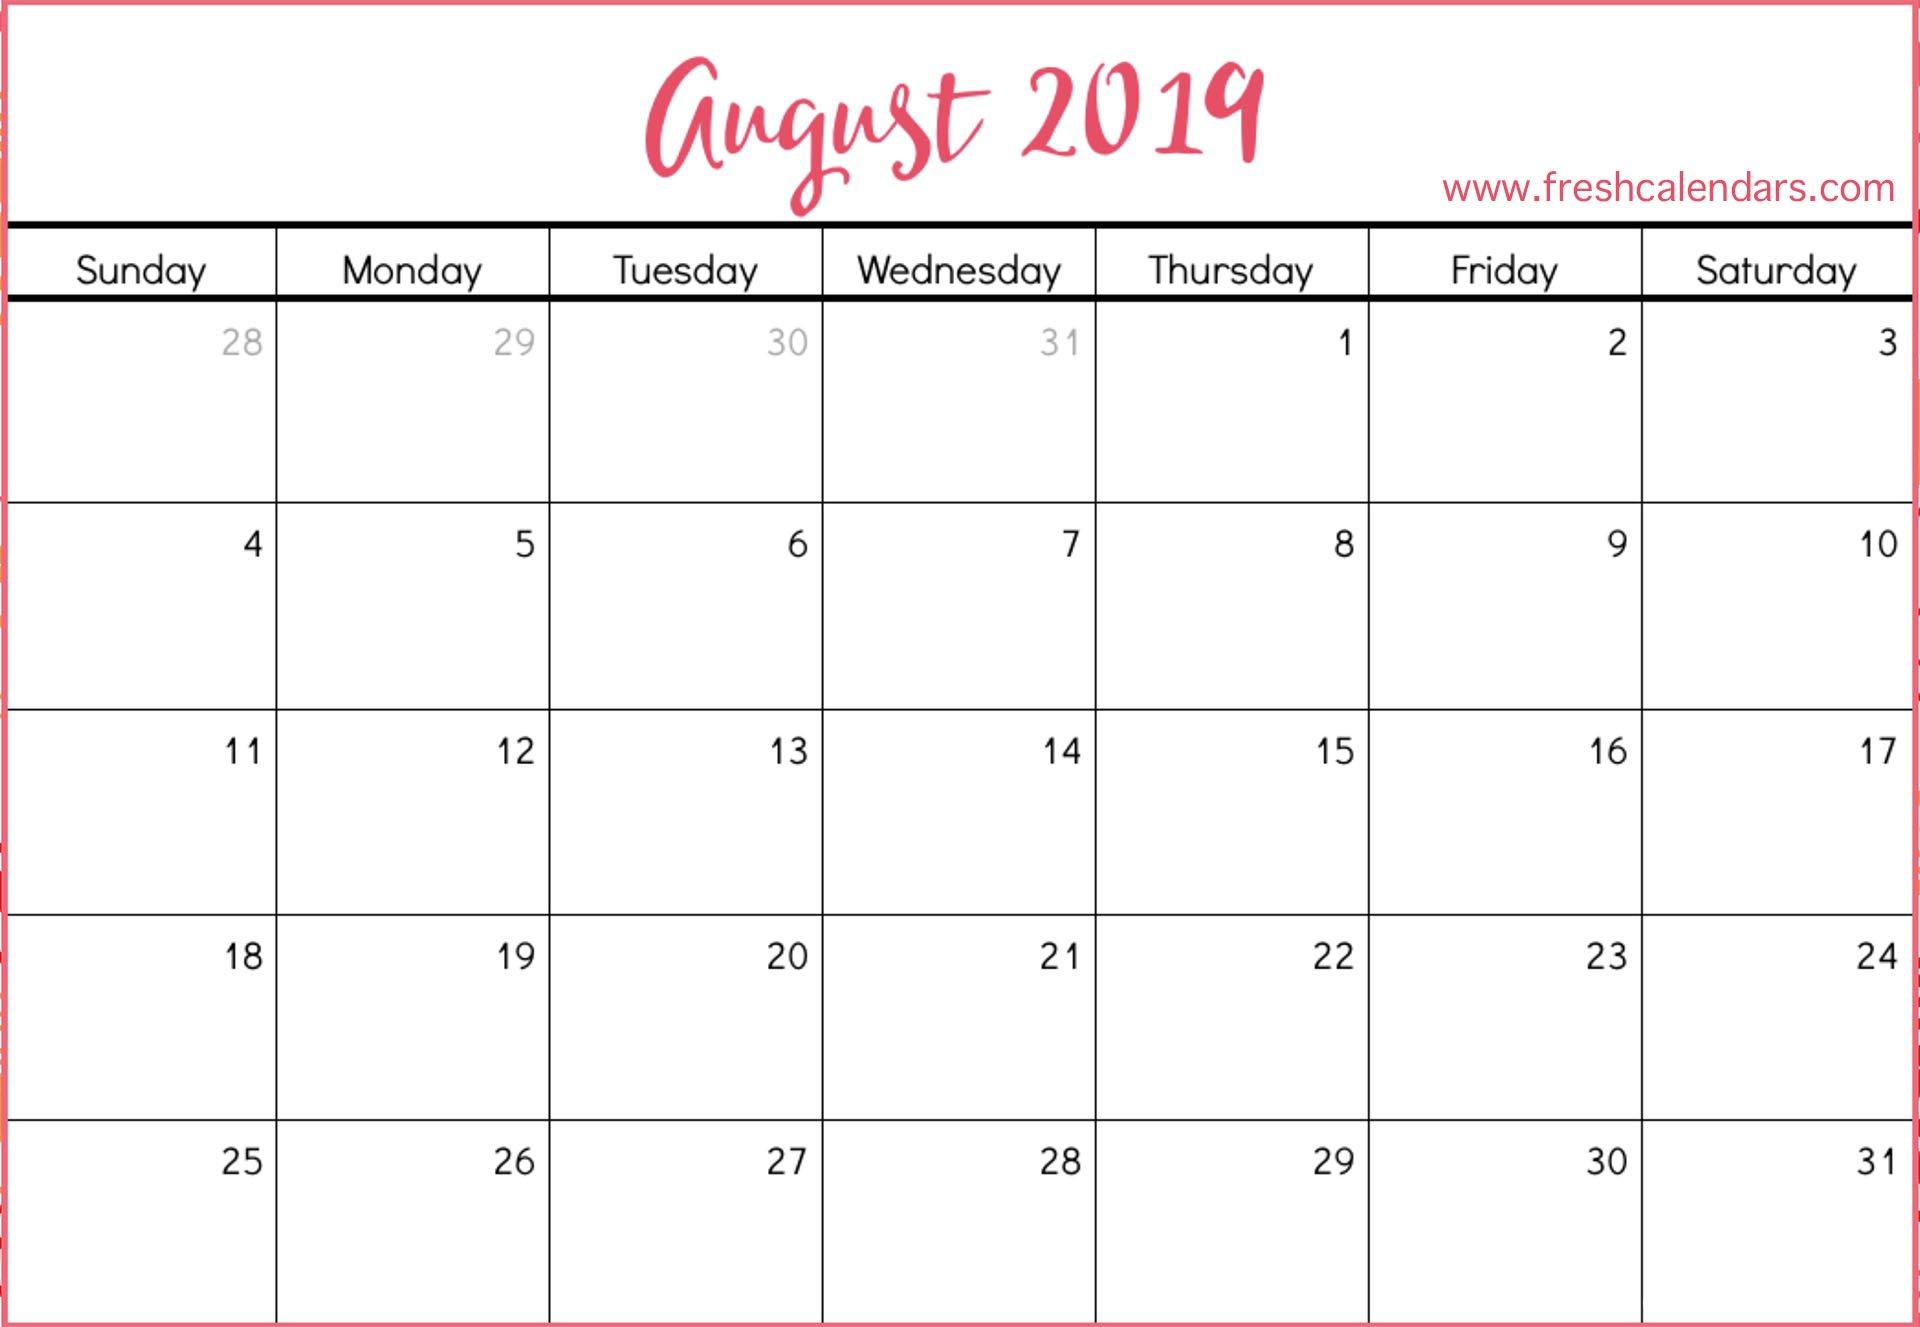 August 2019 Calendar Printable - Fresh Calendars Calendar 2019 August